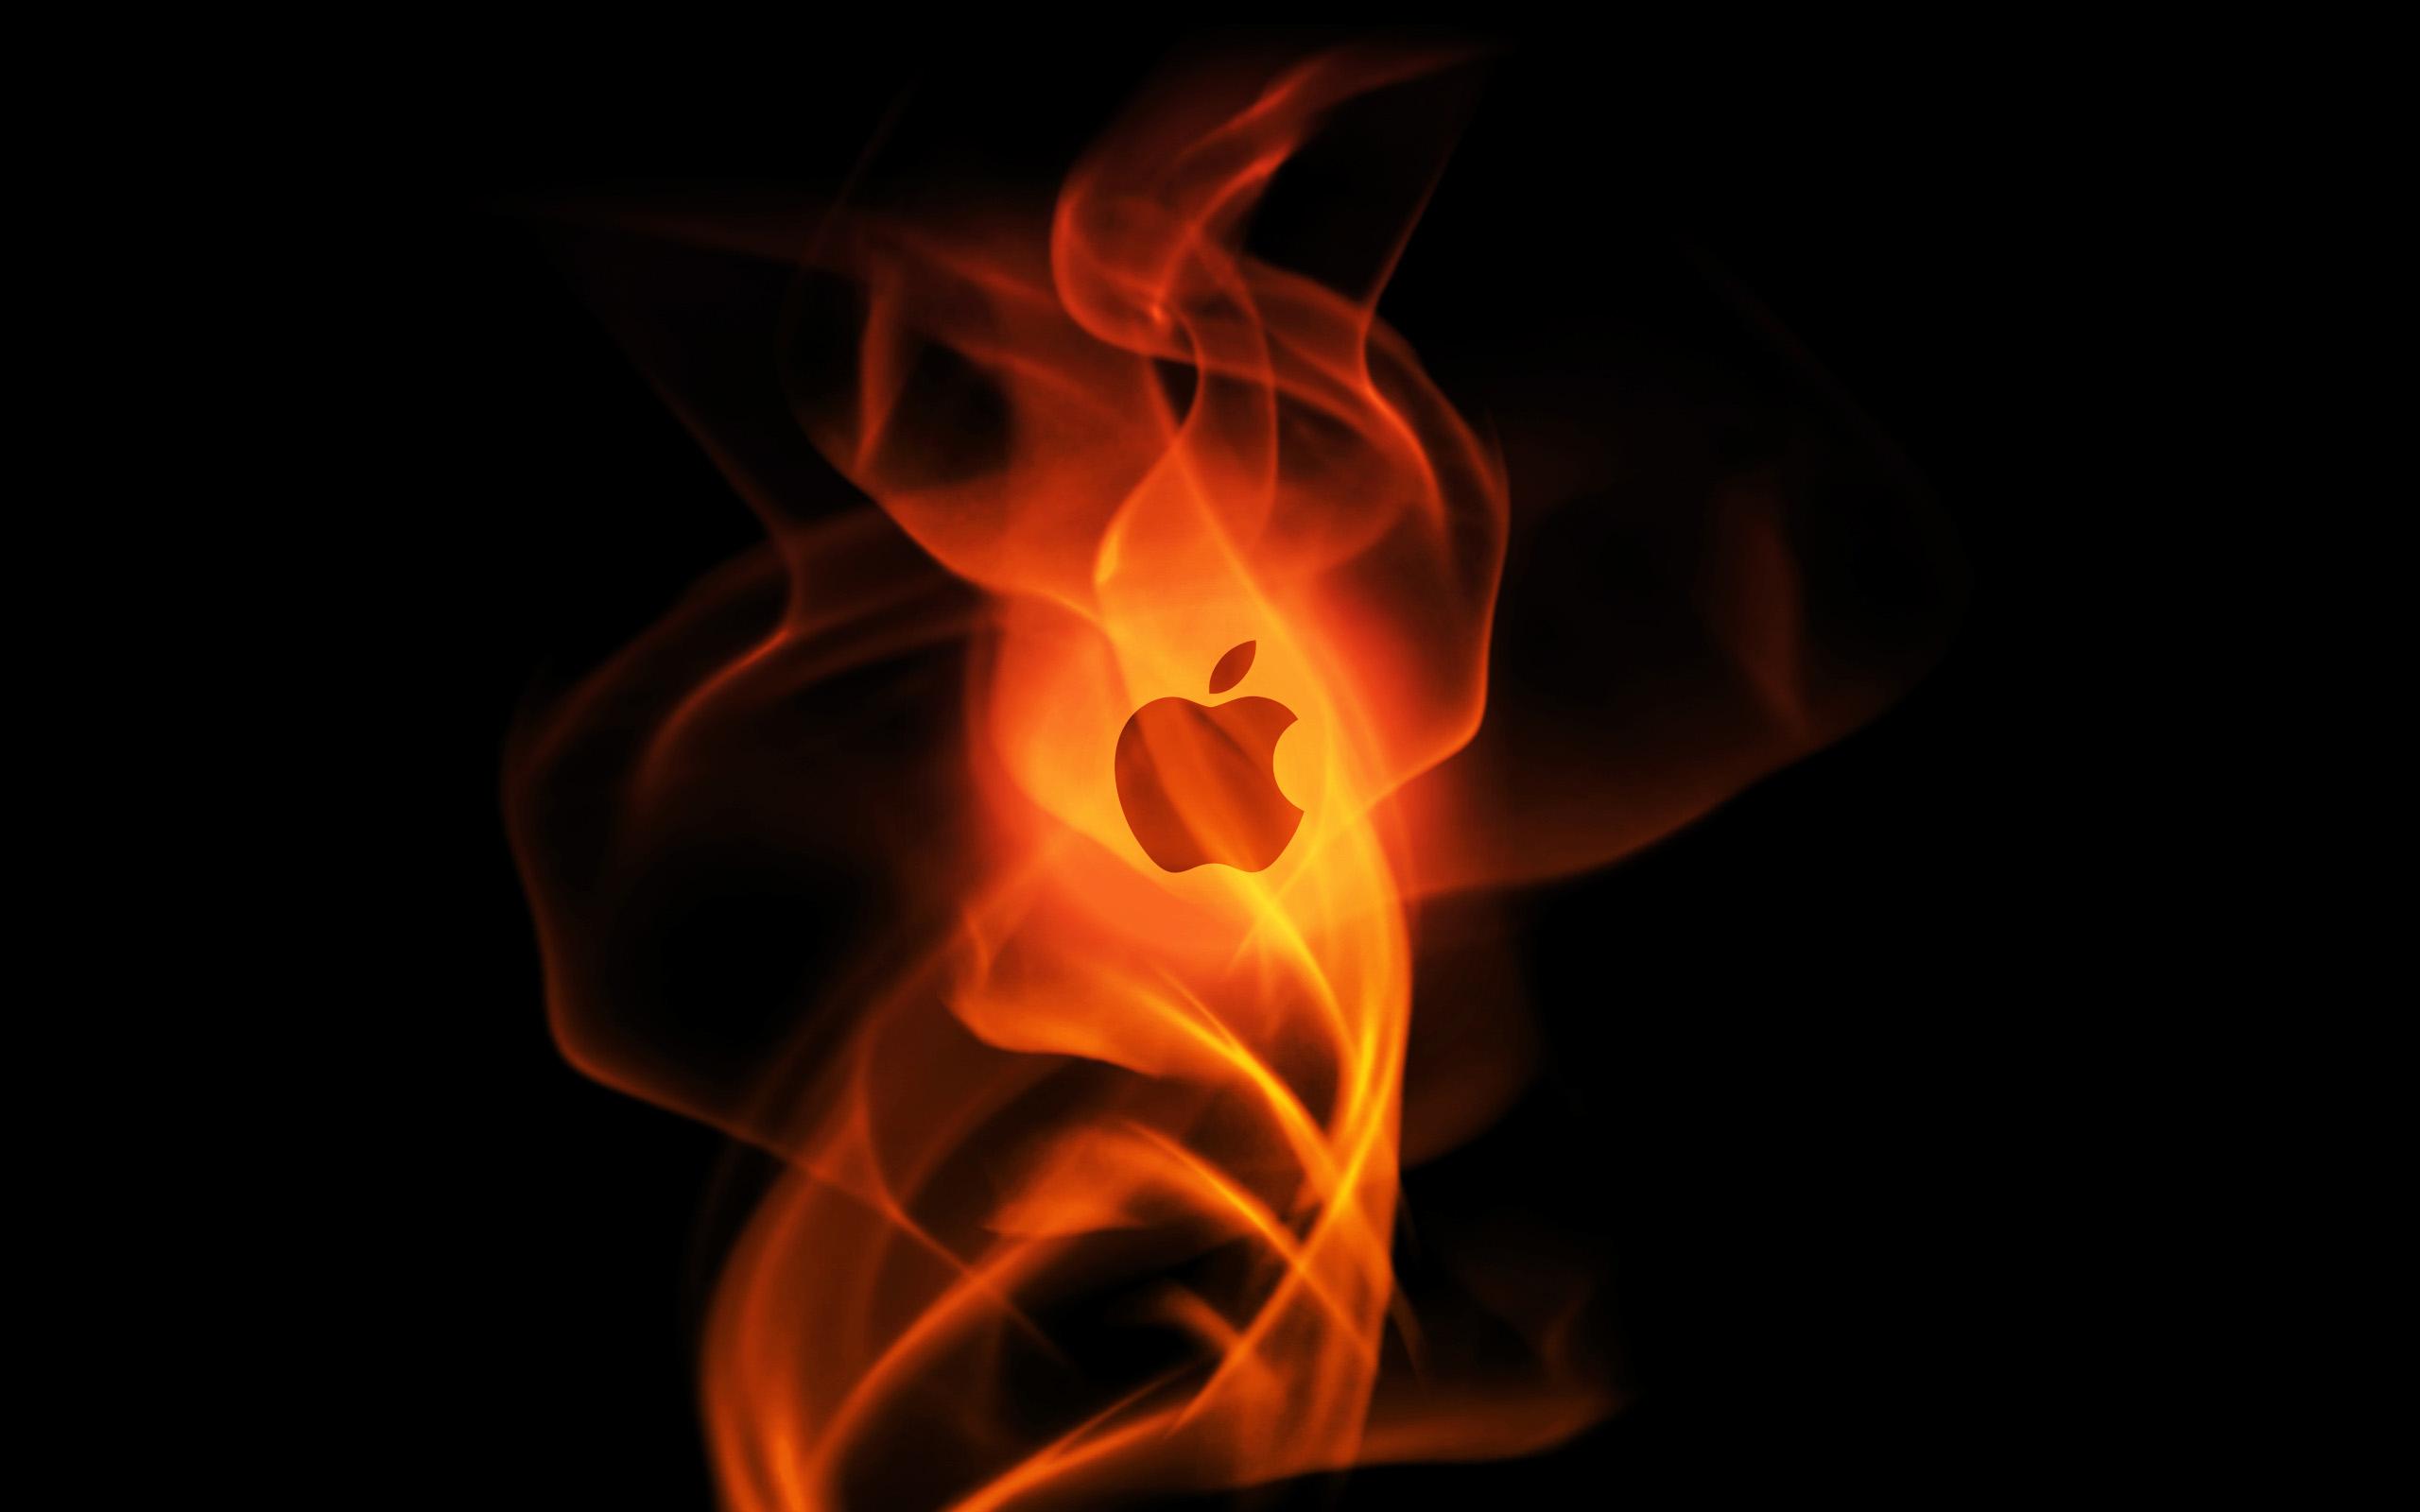 cool apple logo wallpaper 23075